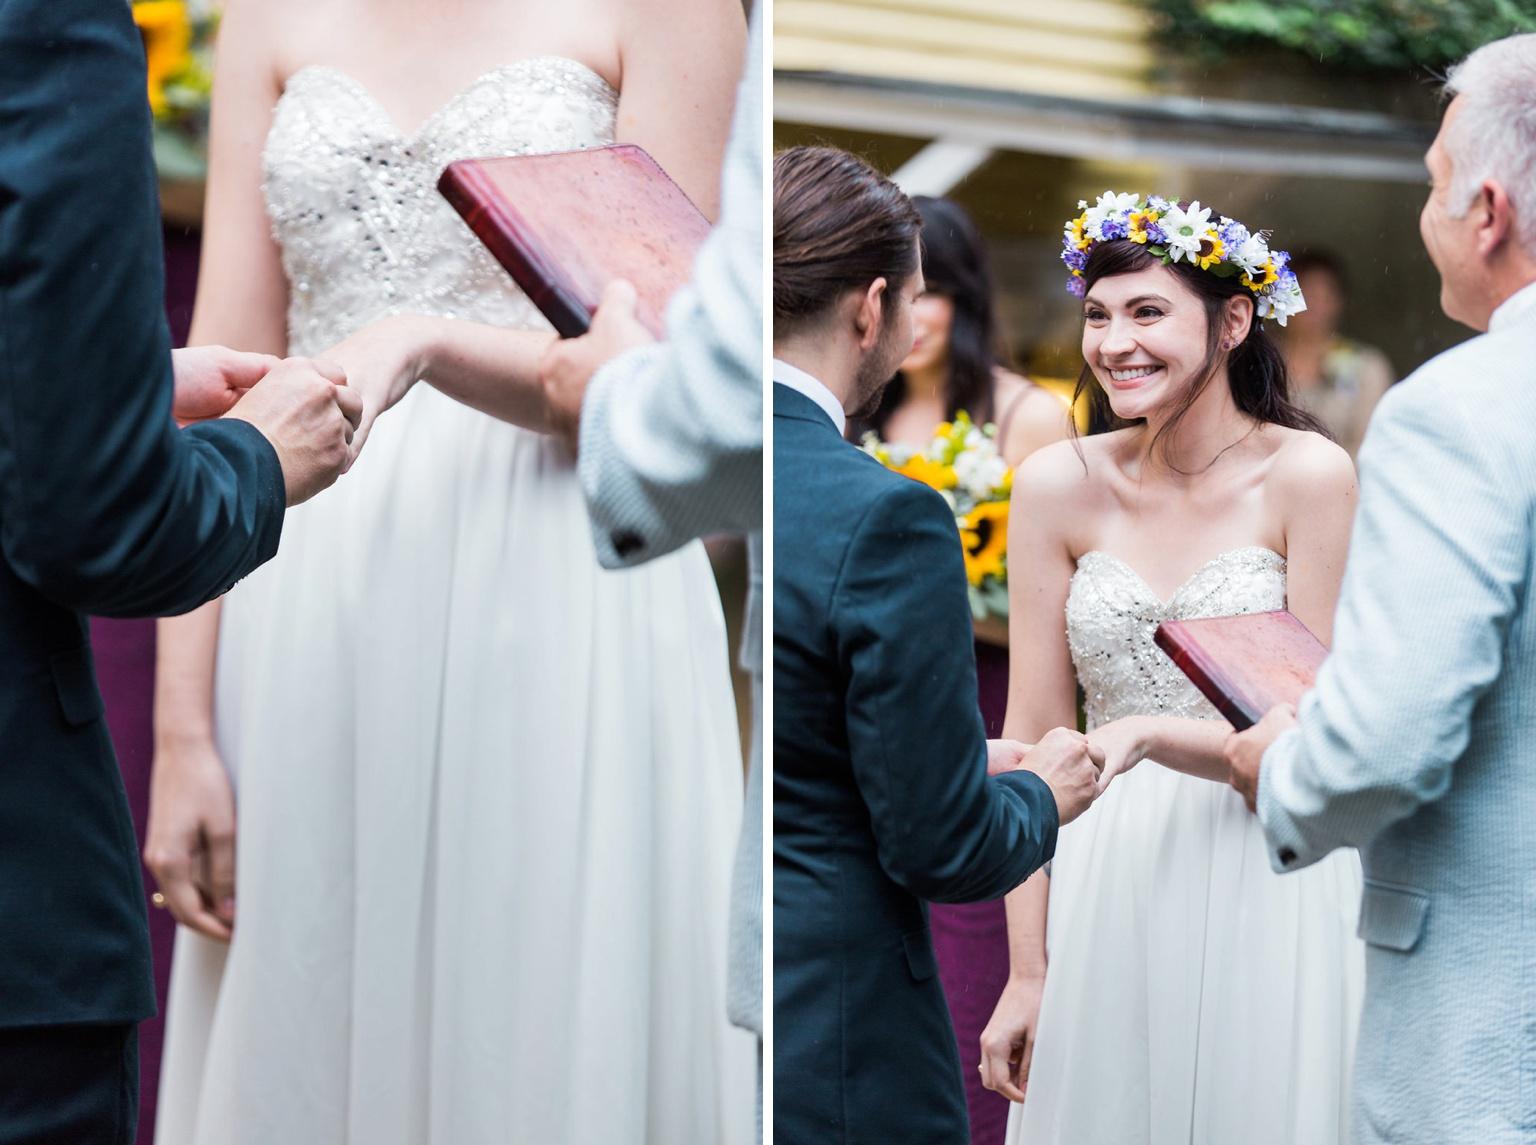 Apt_B_Photo_Savannah_Wedding_Photographer_Flower_Crown028.JPG